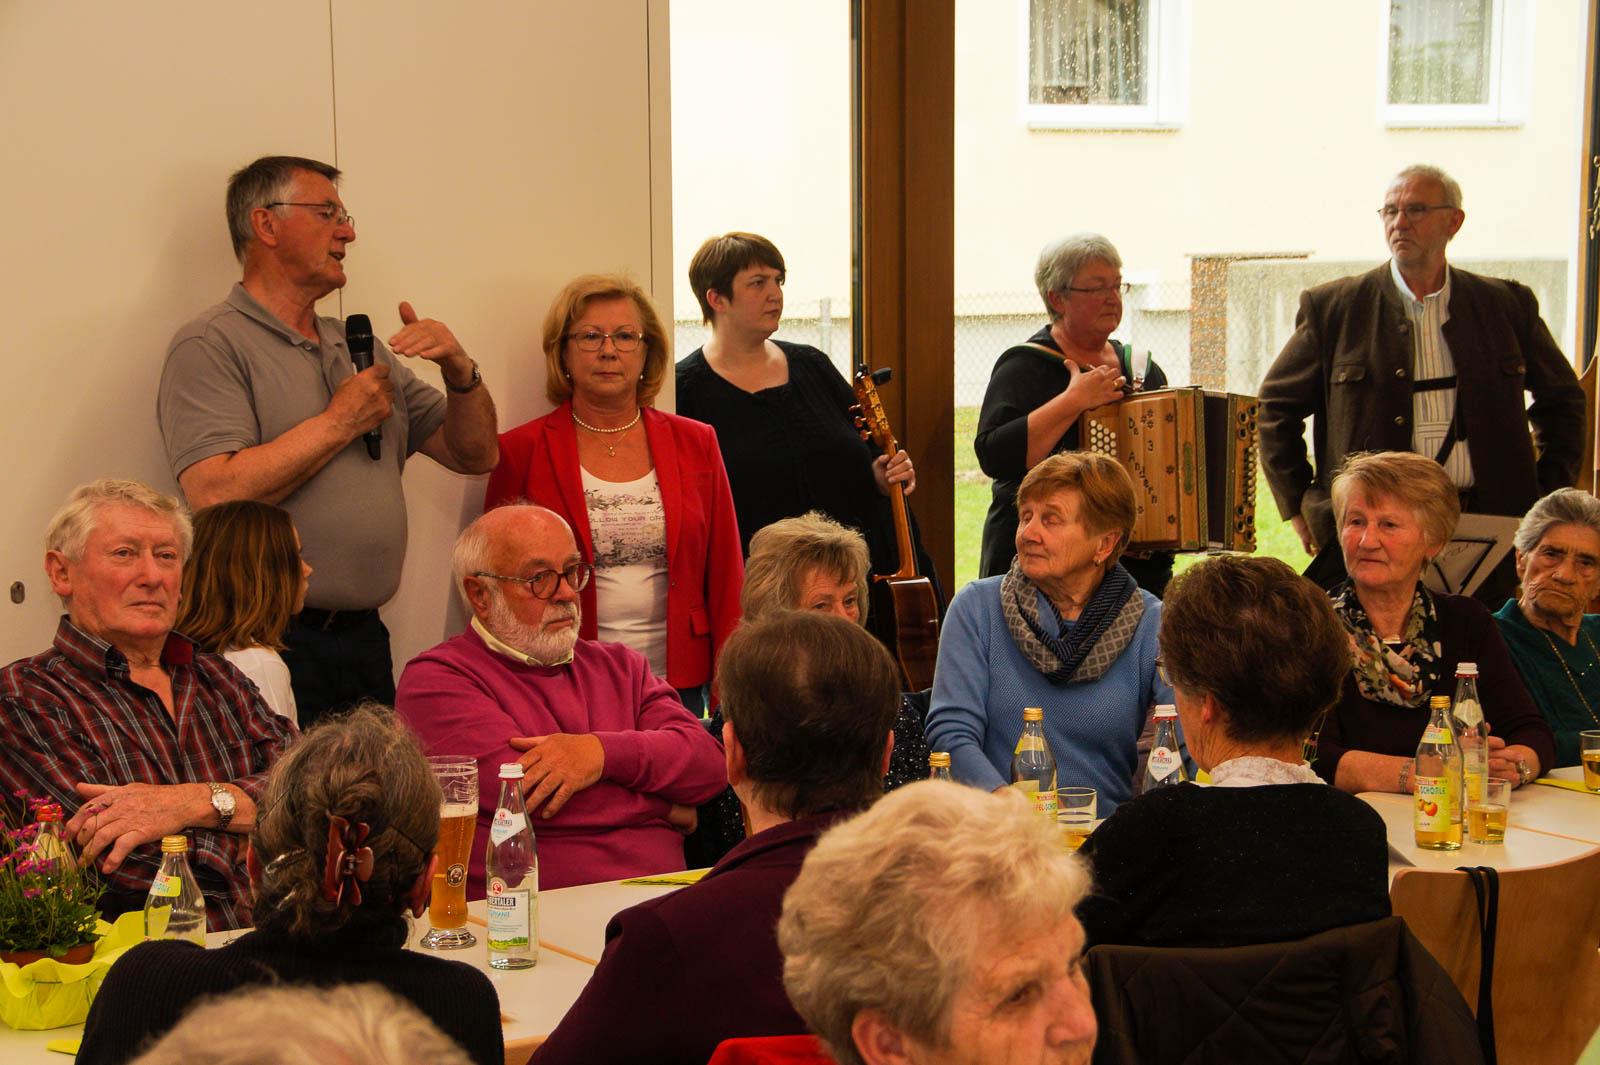 20190504-Seniorennachmittag Johanniter Pfarrheim SF_DSC04170